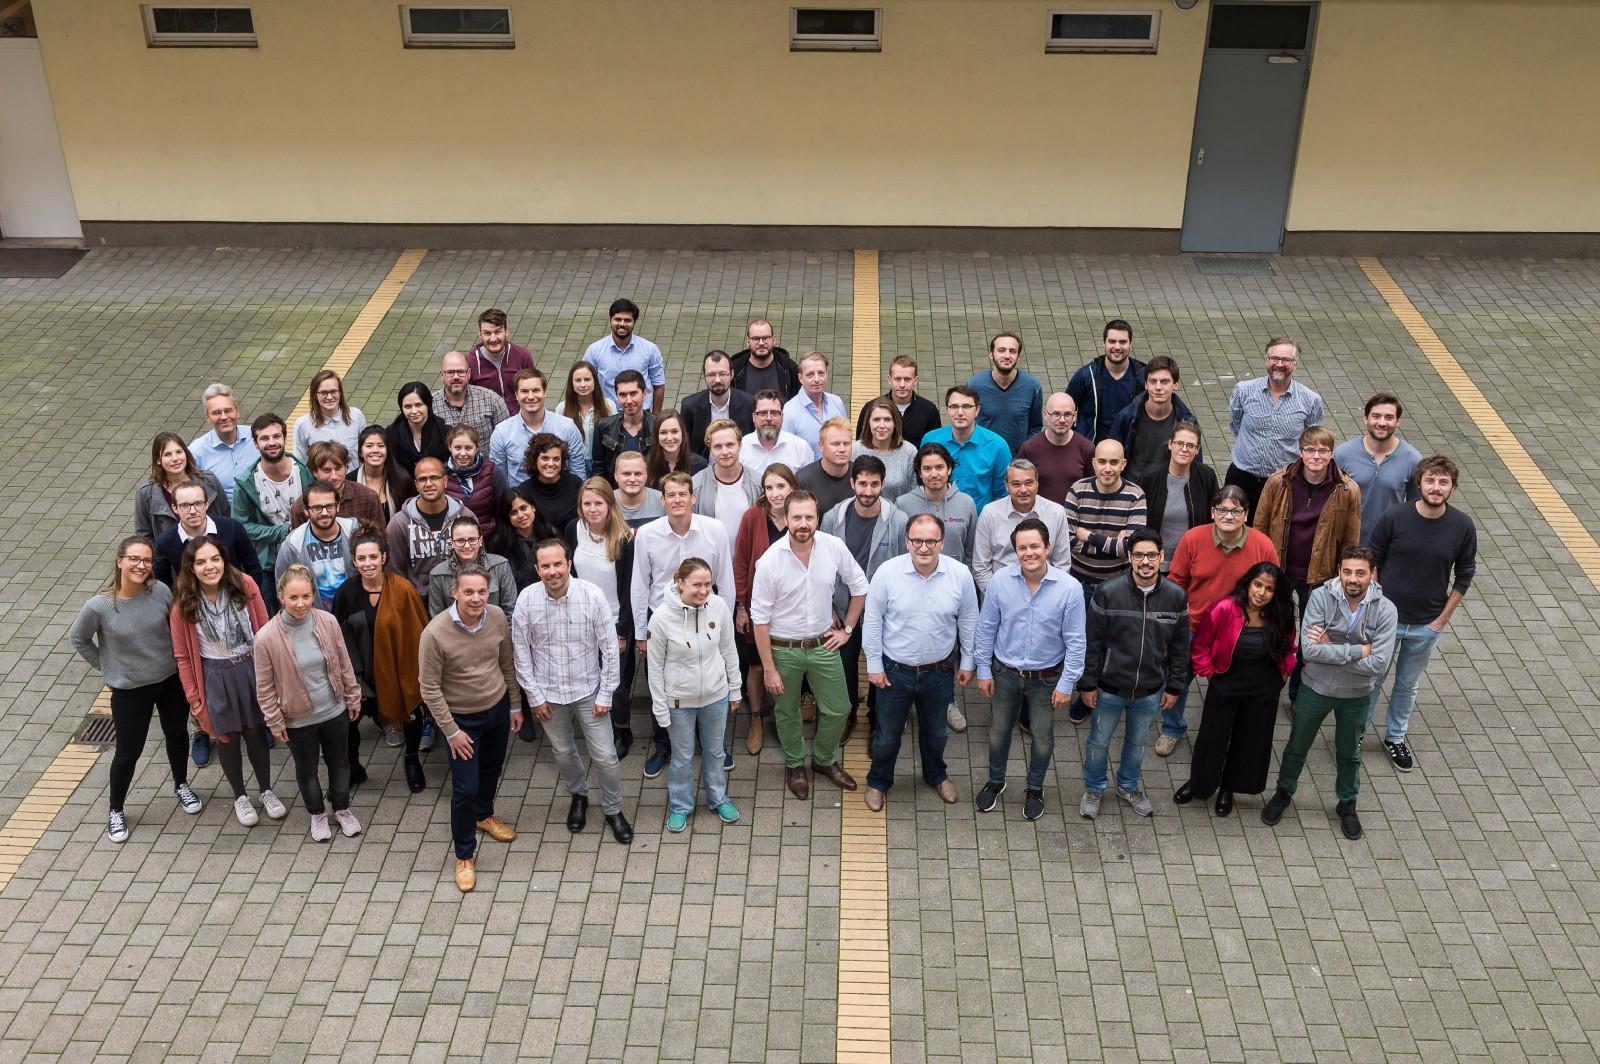 Berlin-based fintech startup Raisin announces €100 million funding round and €10 billion in deposits